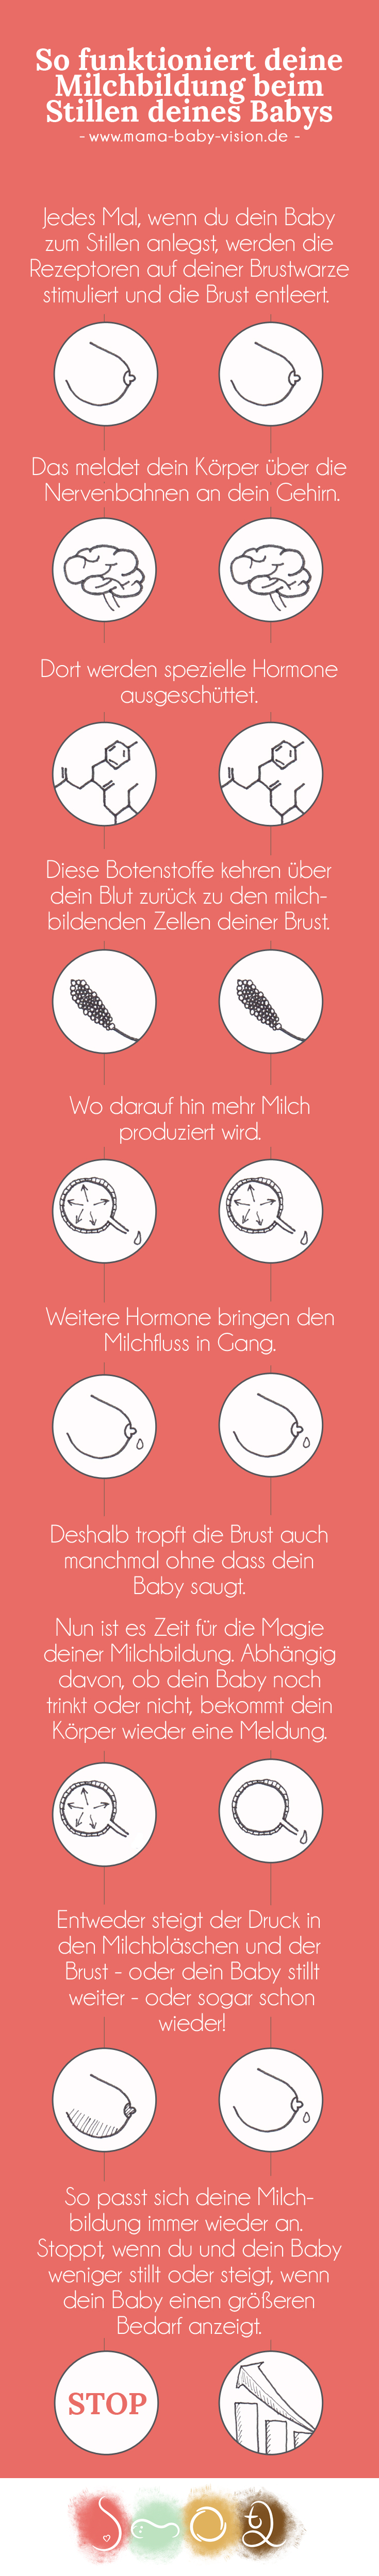 milchproduktion-infografik